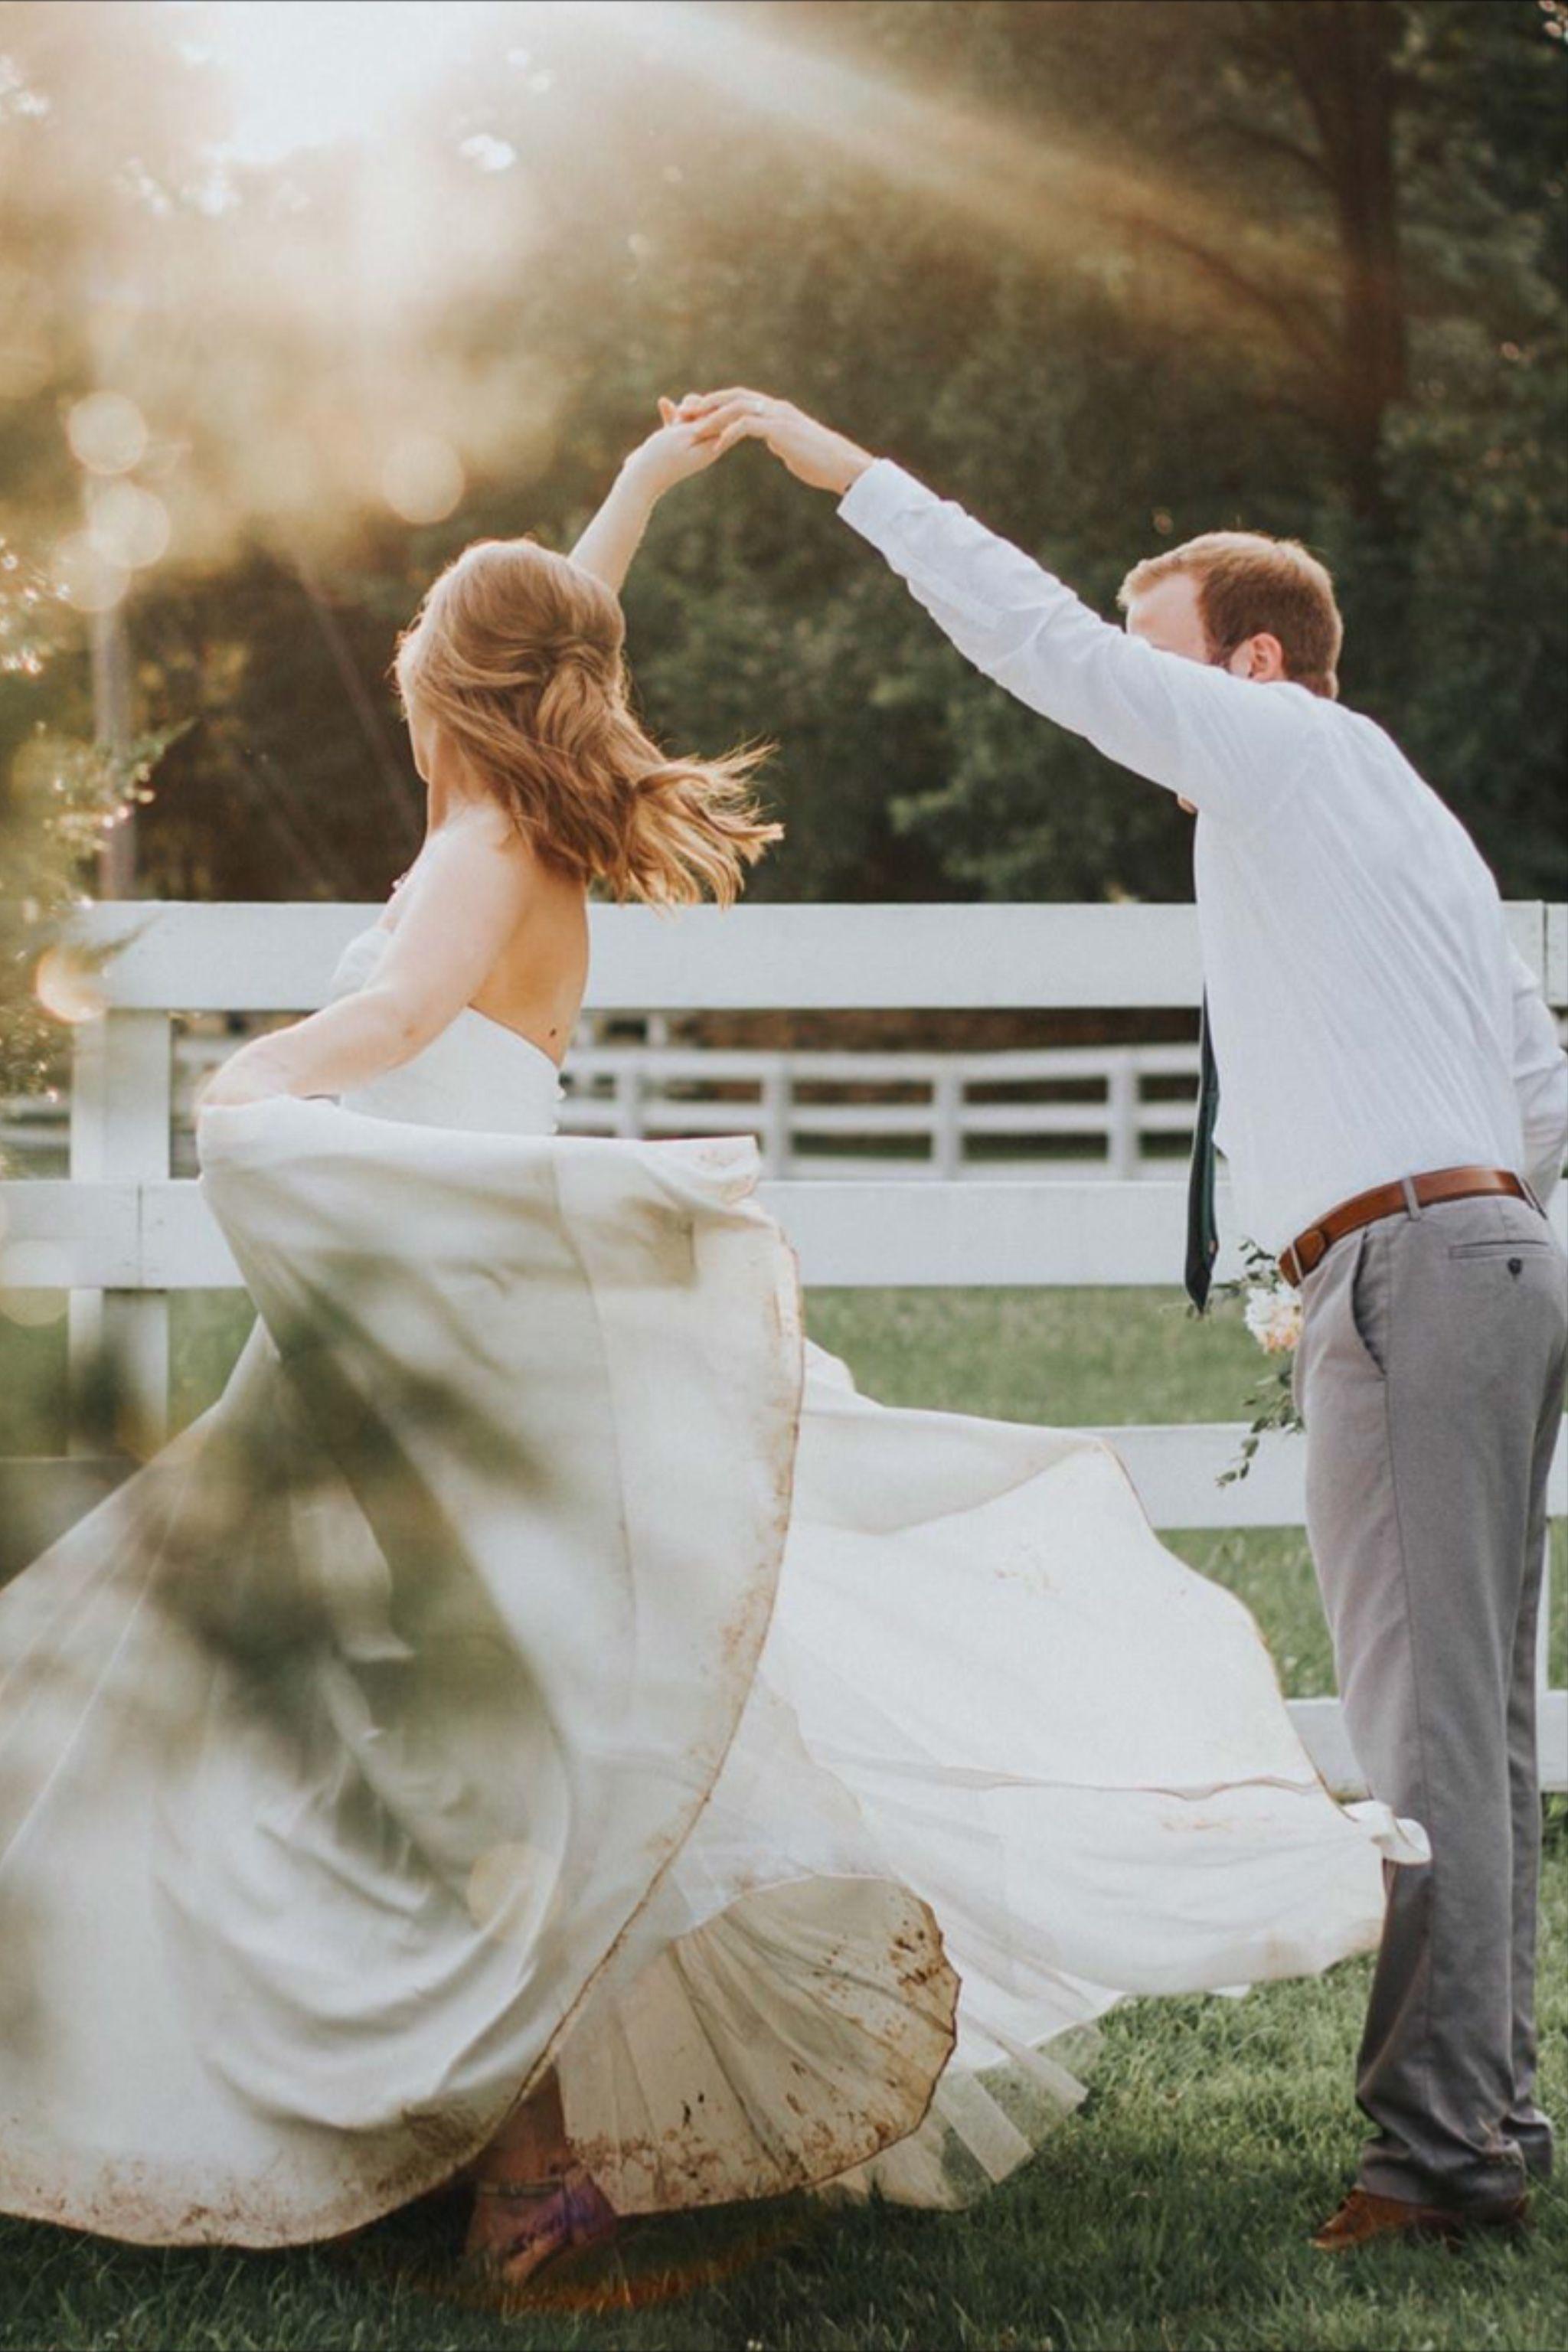 Dancing Couple Photography Dance Photography Poses Couple Dance Photography Couple Photography